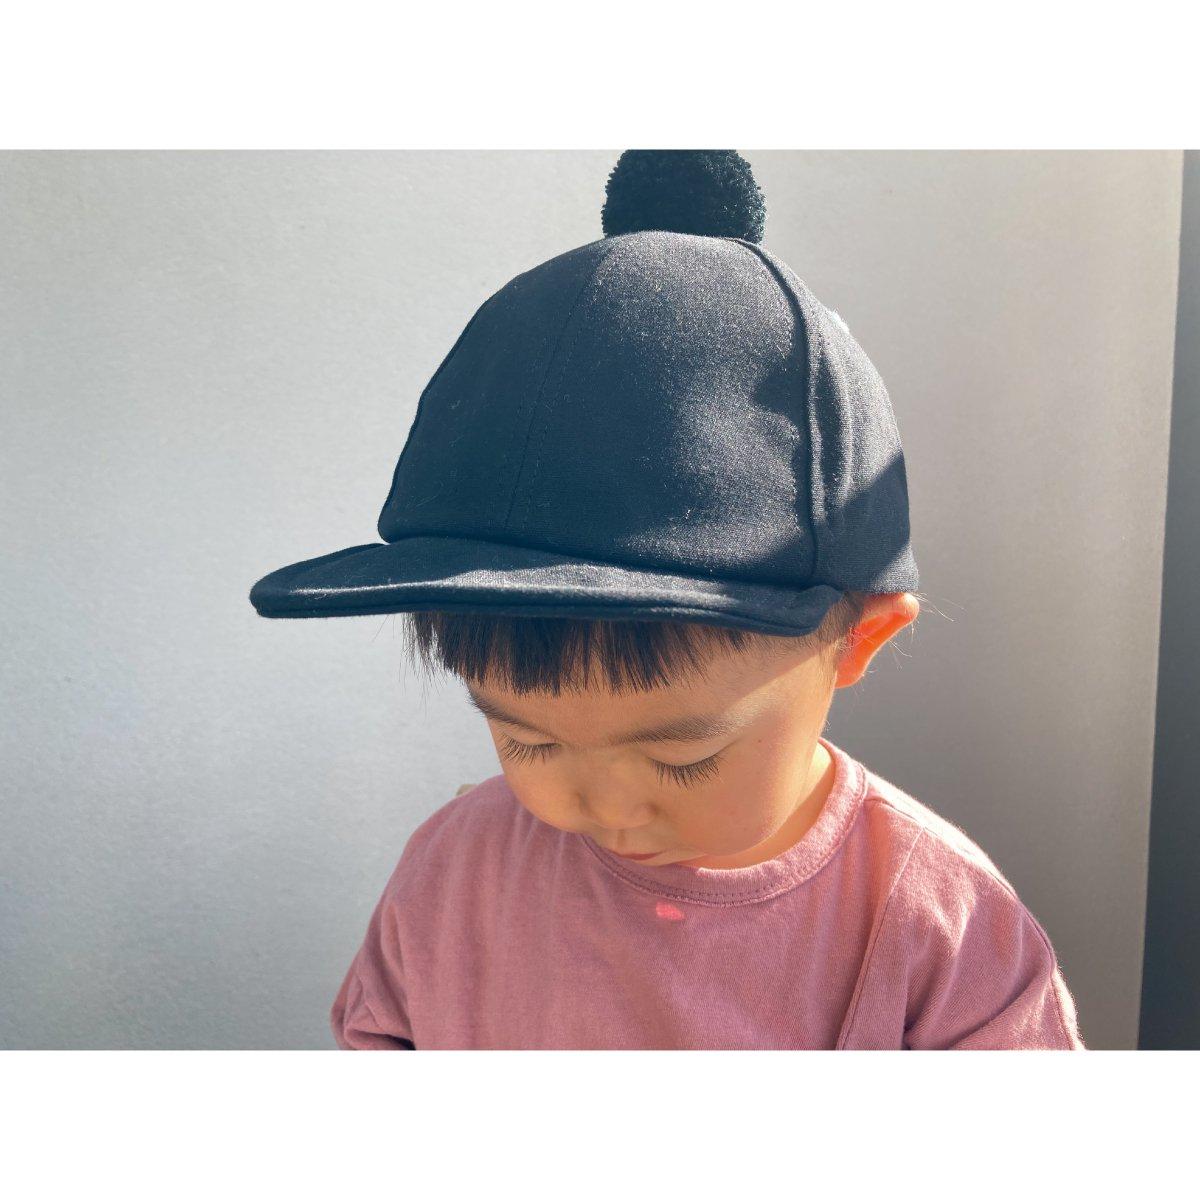 【KIDS】Dull Pon Cap 詳細画像29